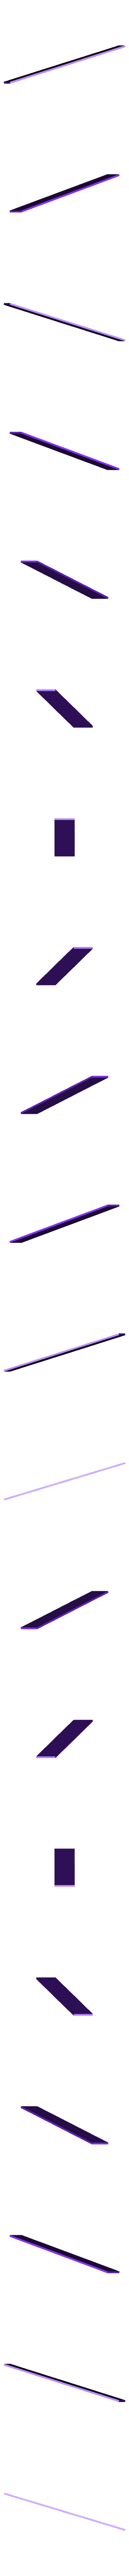 2.stl Download free STL file Deagostini Millennium Falcon Engine Exhaust SOLO version • 3D print object, boryelwoc